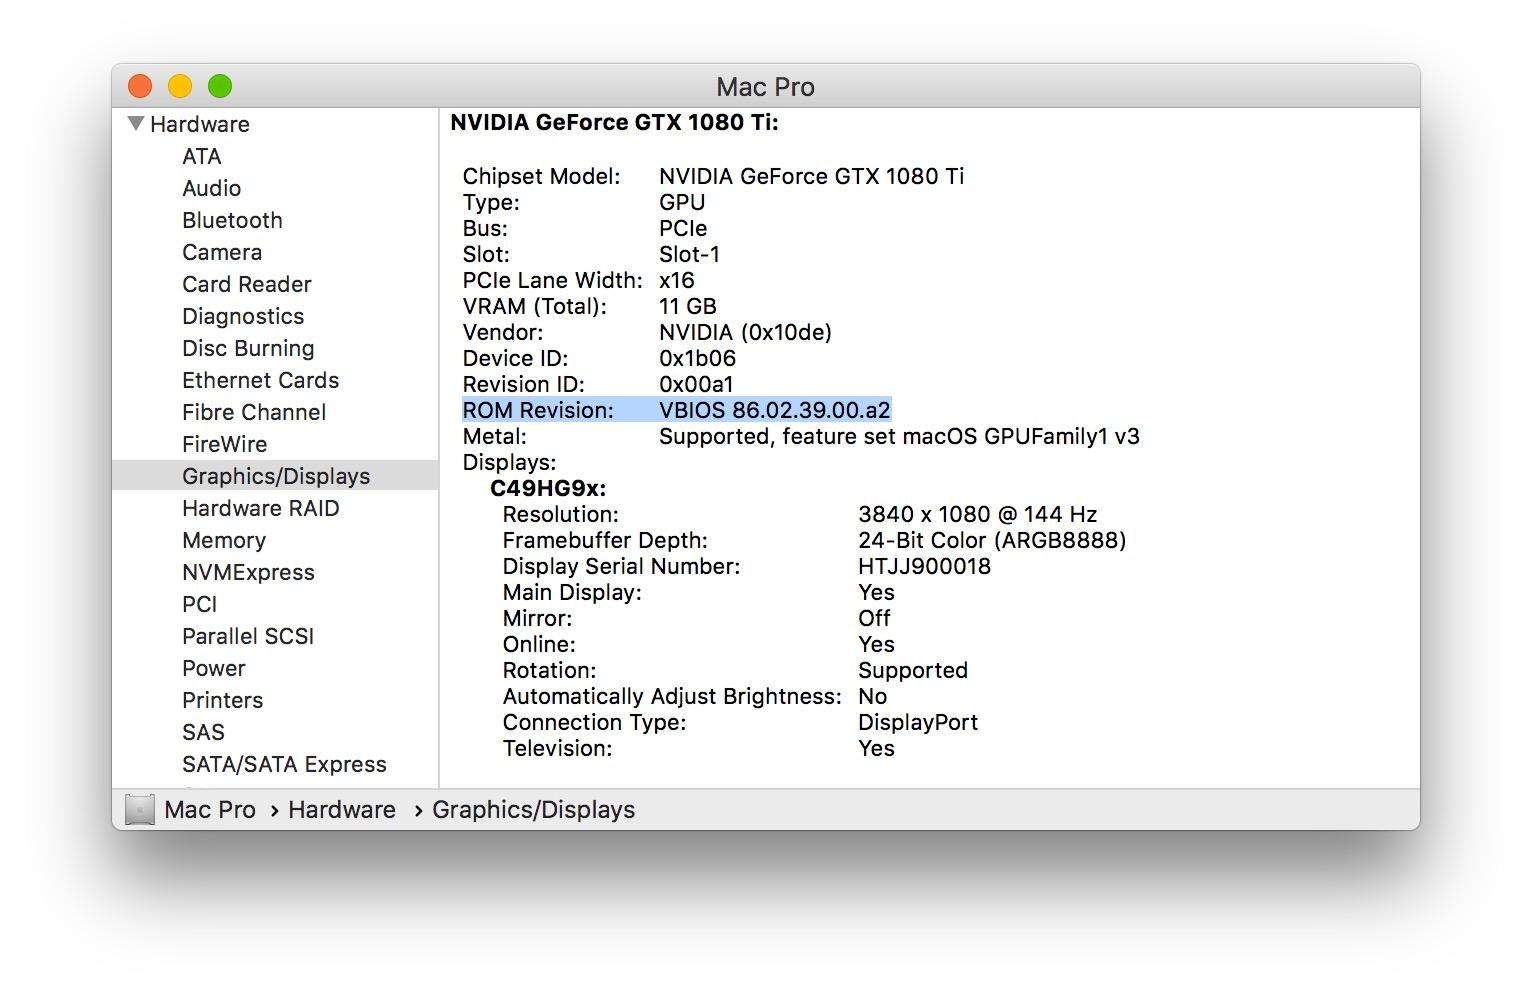 MP All Models - AMD Polaris, Vega, & Navi GPU macOS Support